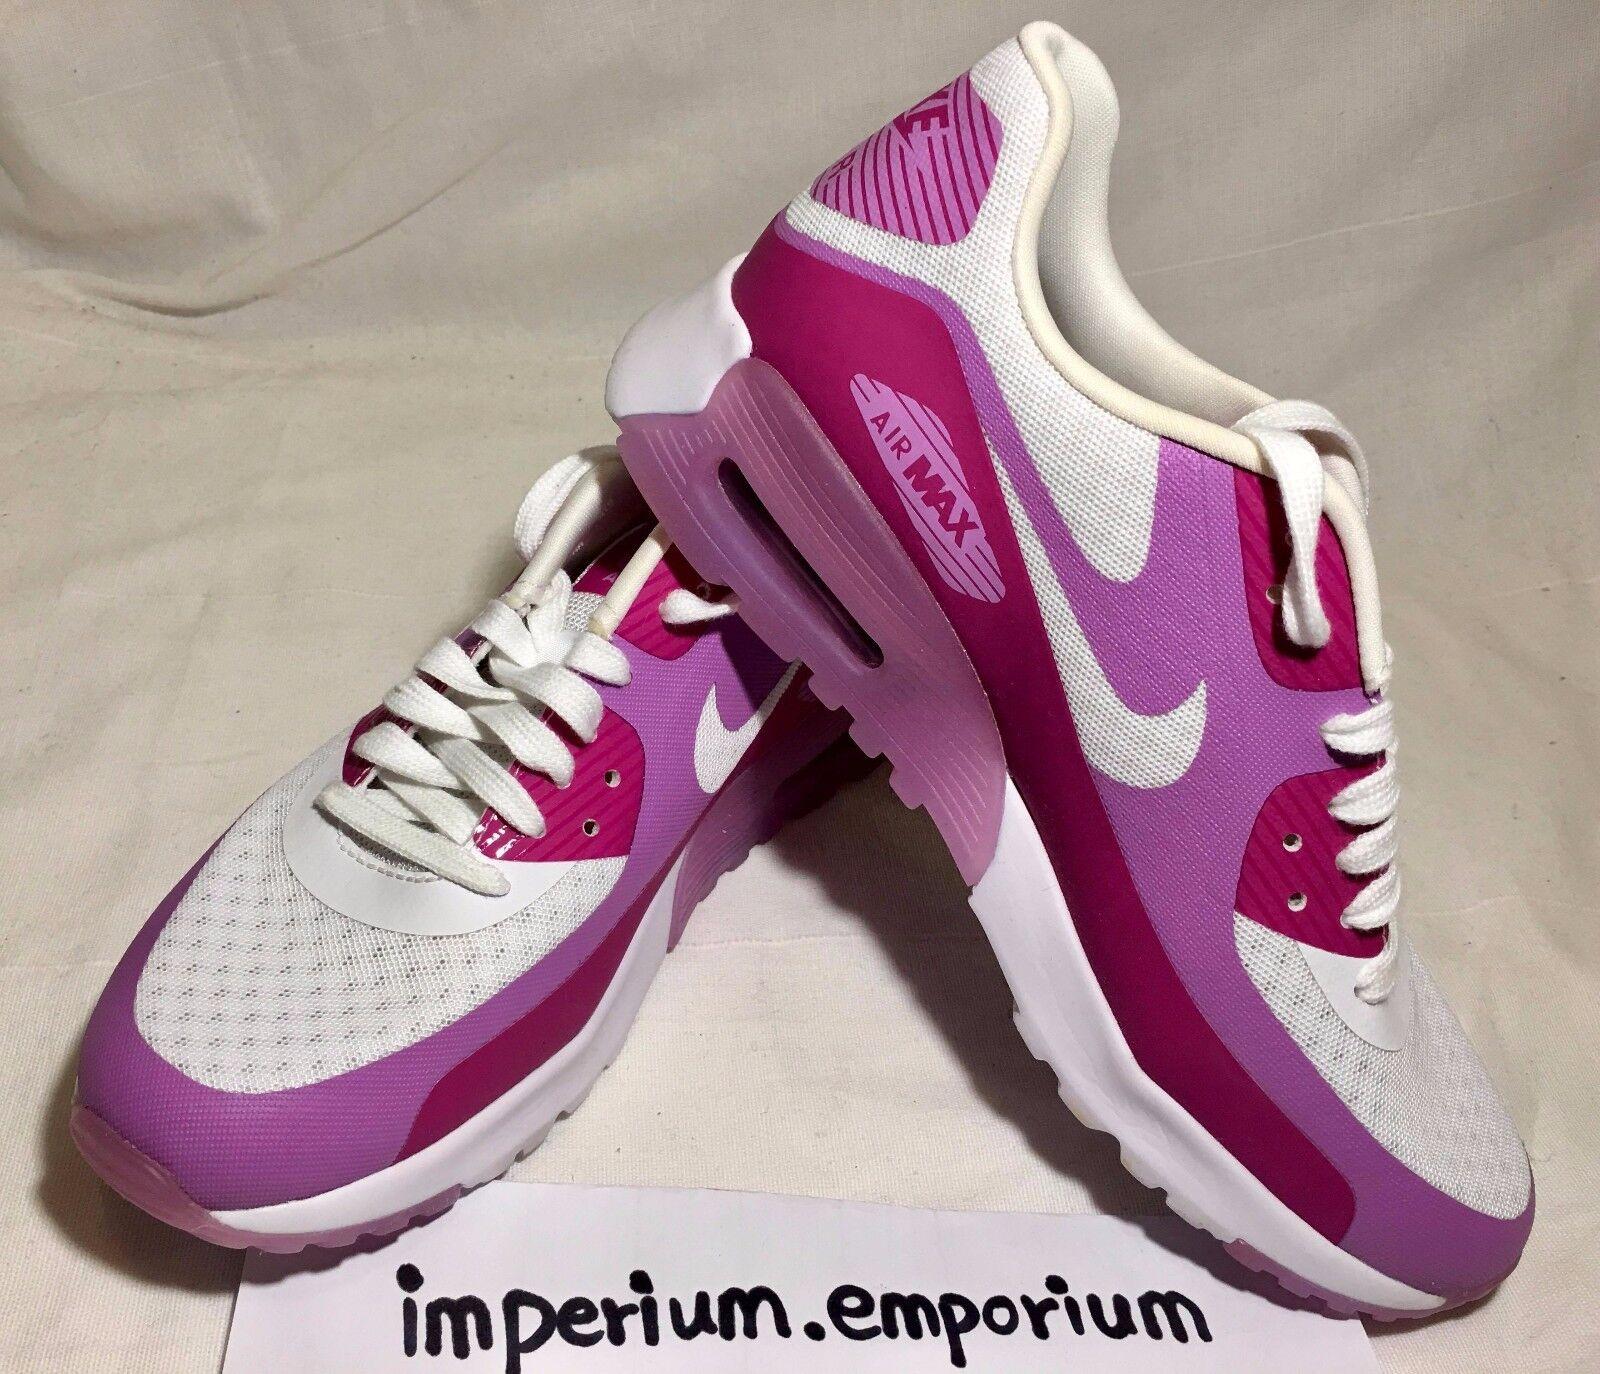 Nike Women's Women's Women's Air Max 90 BR White Pink Trainers Size UK 4.5 ec2984